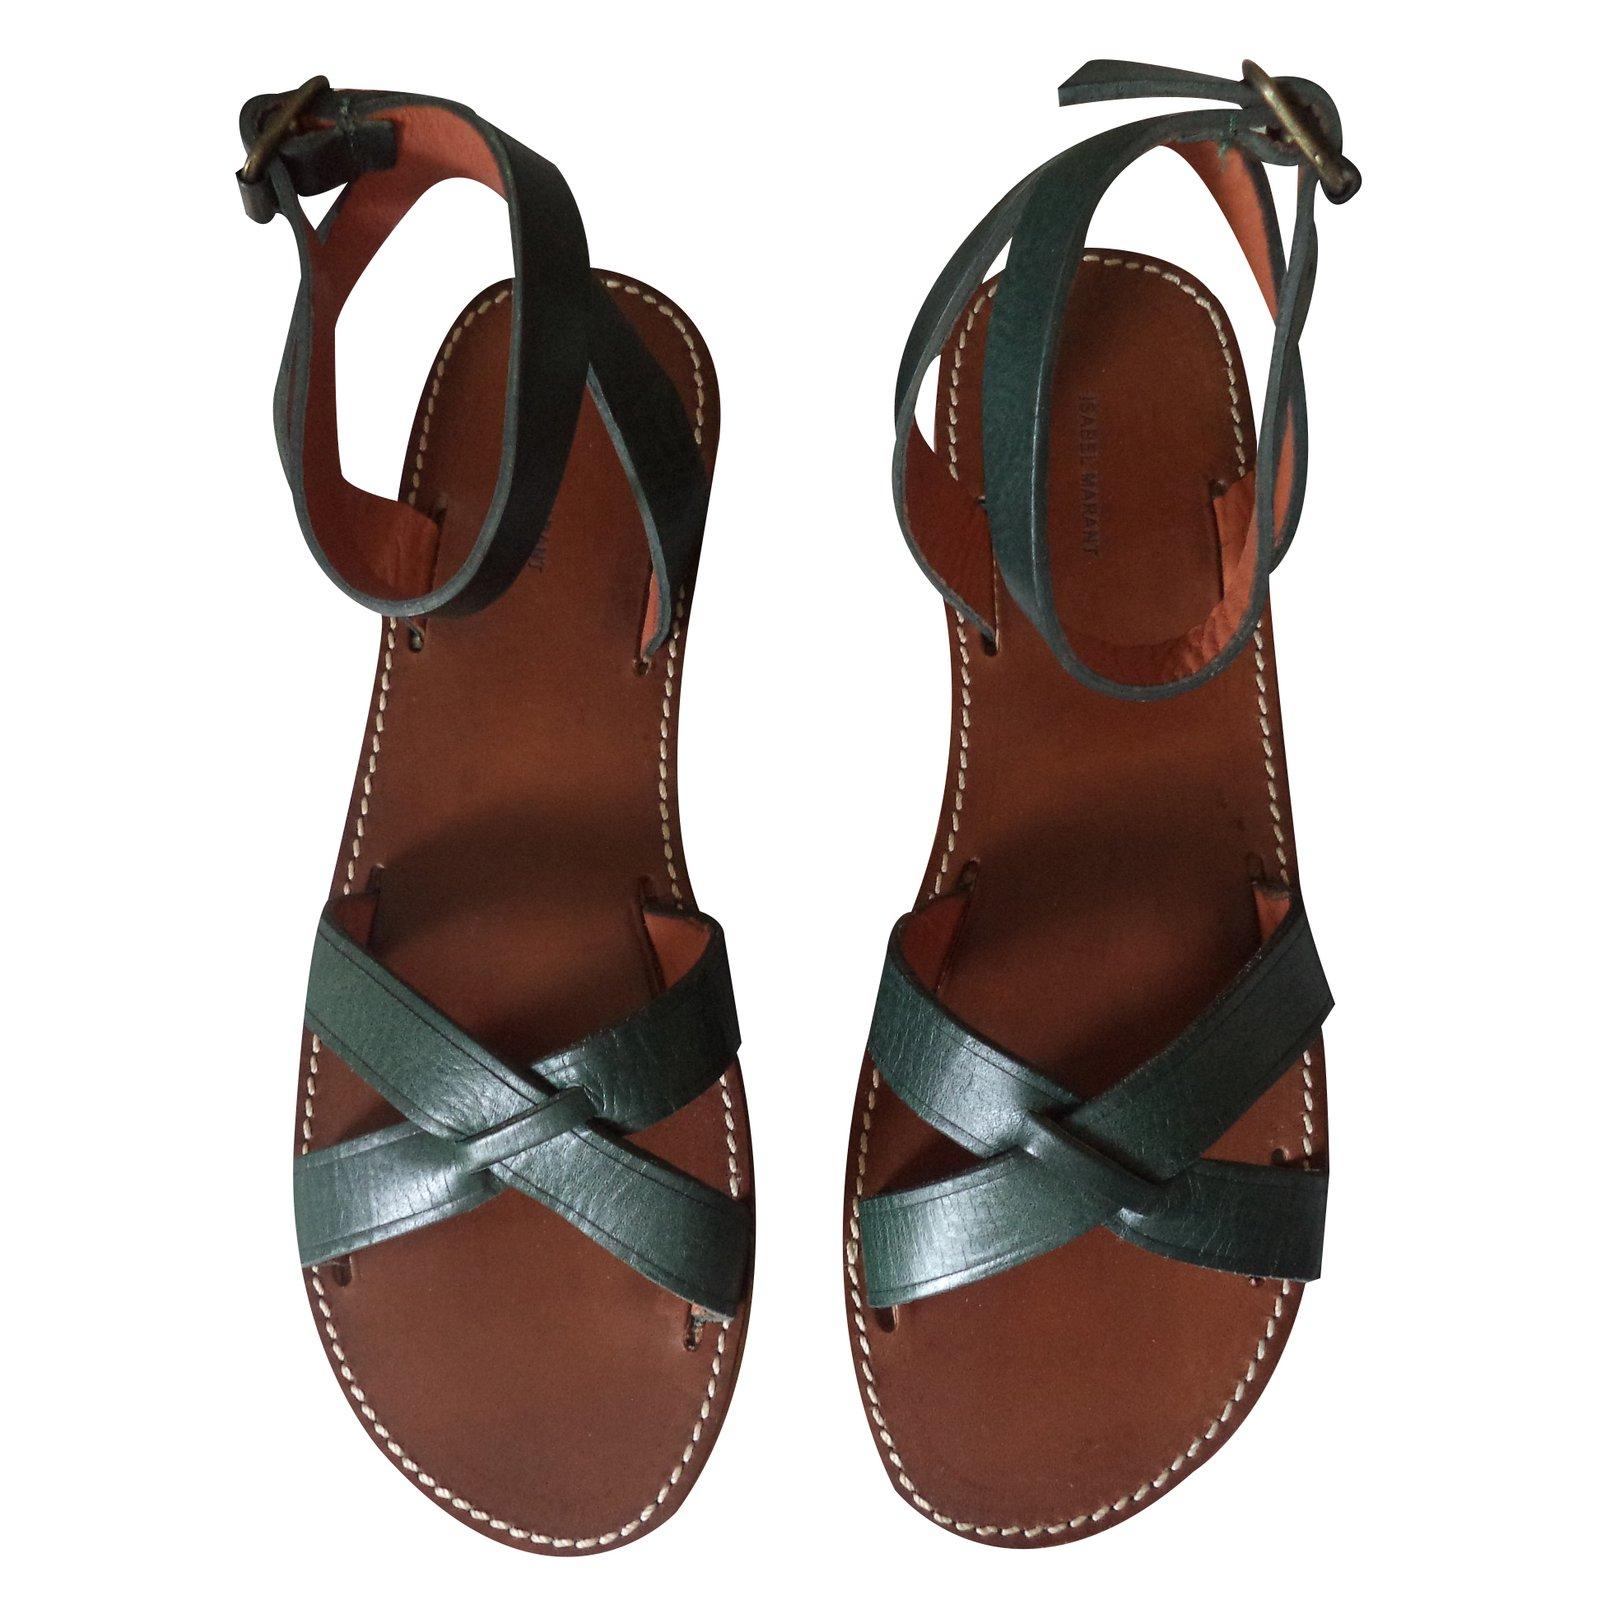 36c064307ea5c Isabel Marant MERRY Sandals Leather Green ref.21762 - Joli Closet